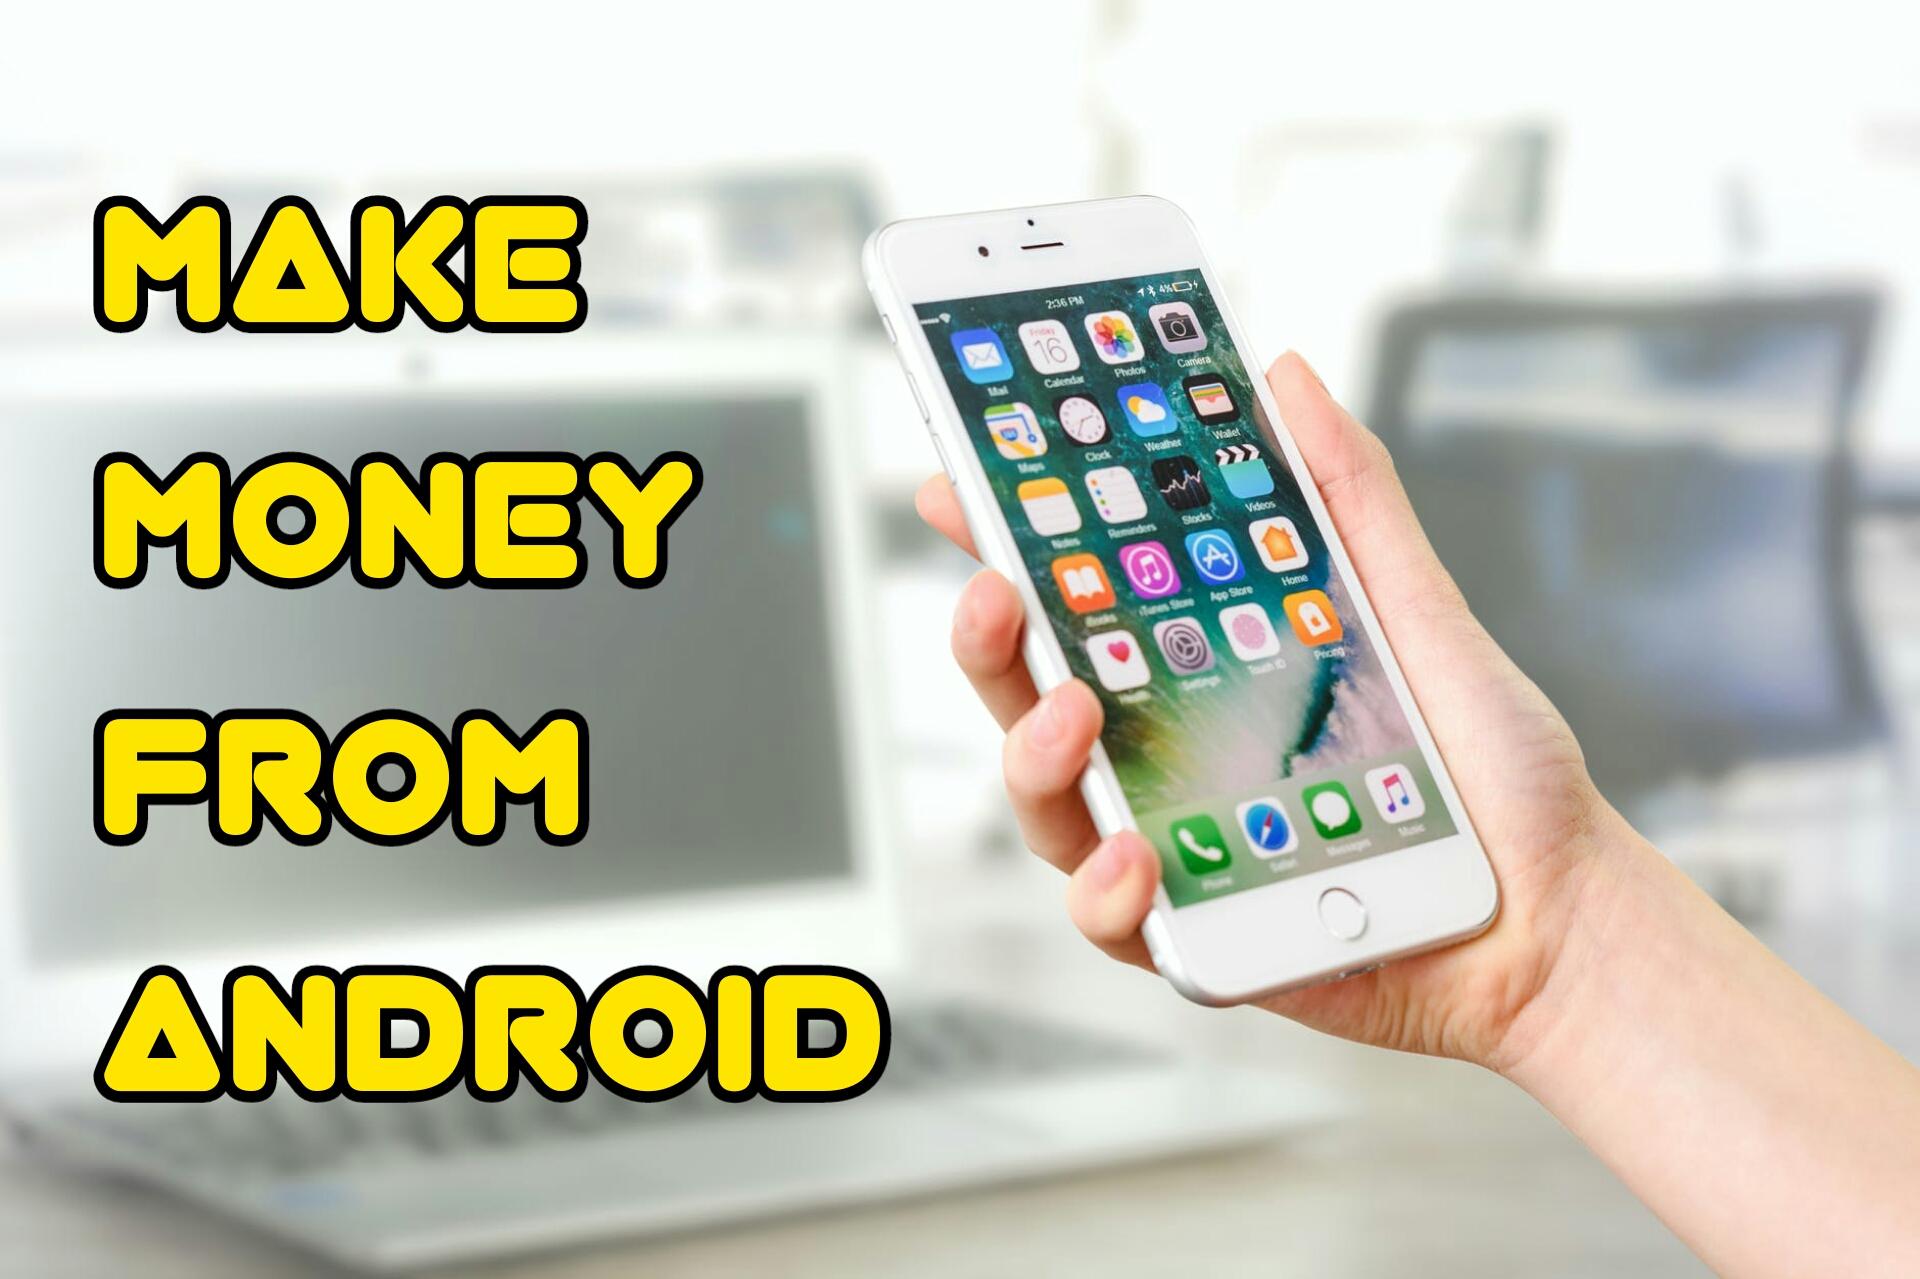 बिना Games खेले पैसे कमाने वाले 4 Apps | Best 4 Paytm Cash Earning Apps